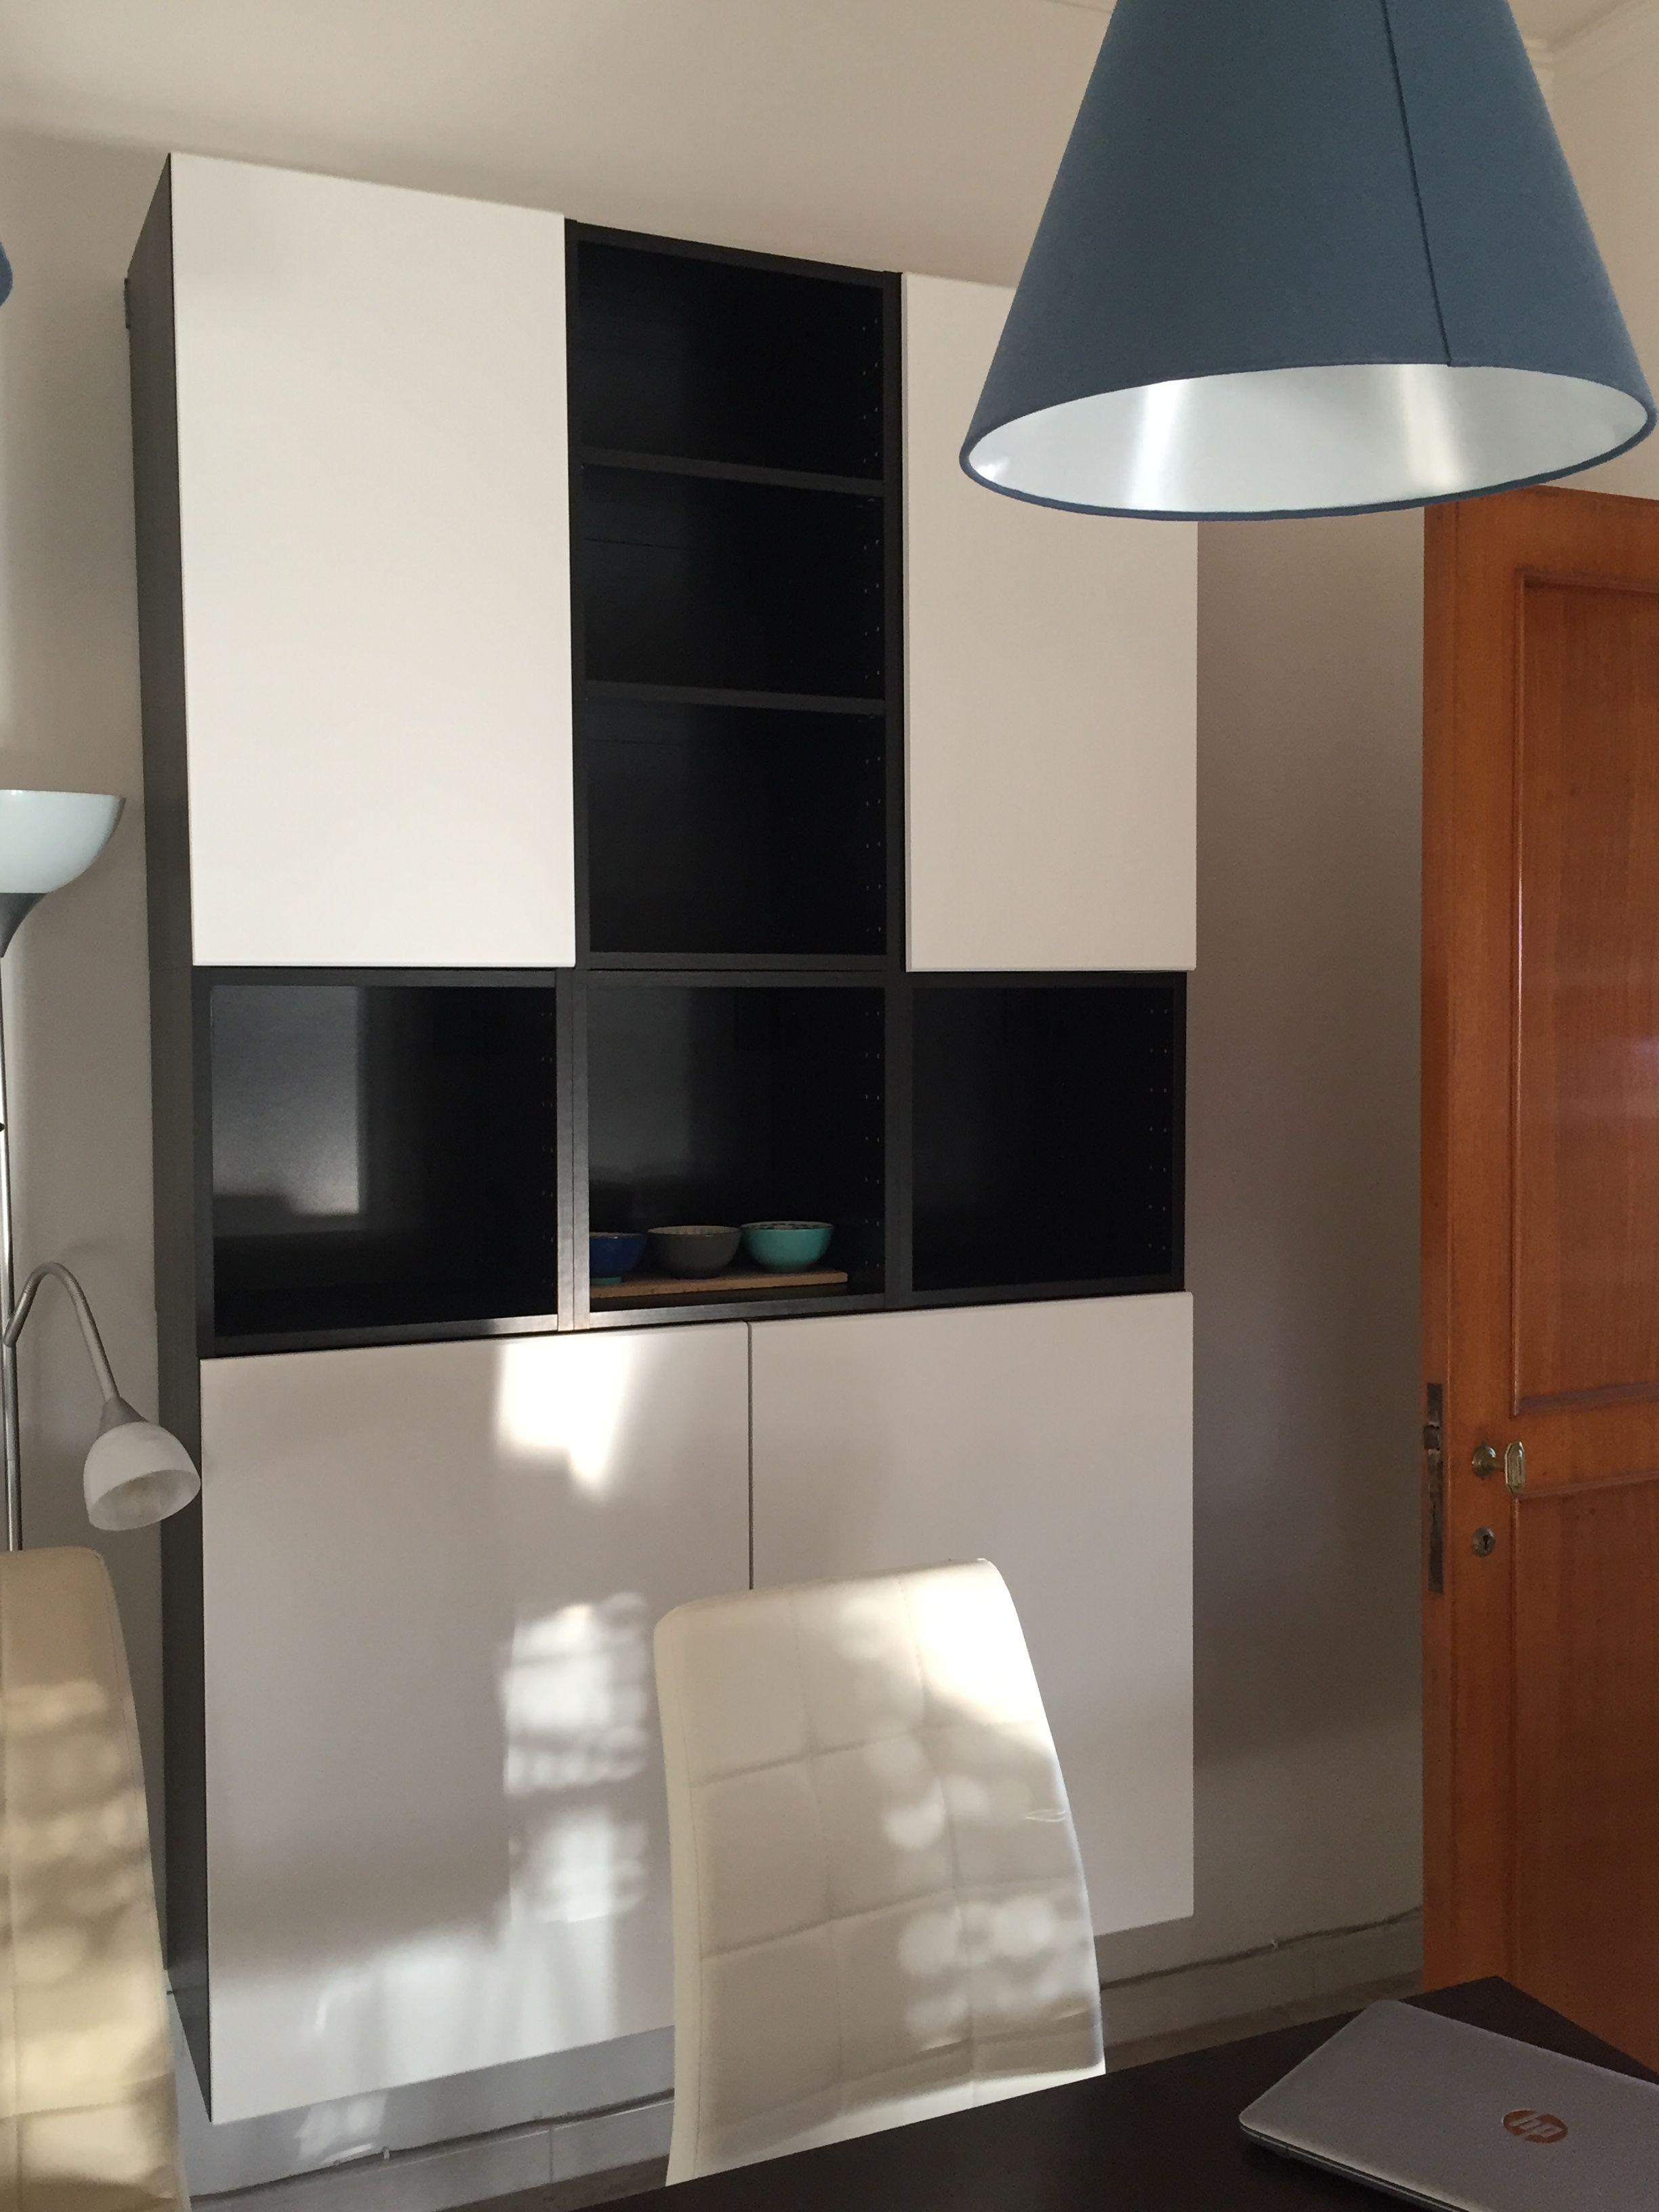 Ikea method Idee per la casa, Idee, Case